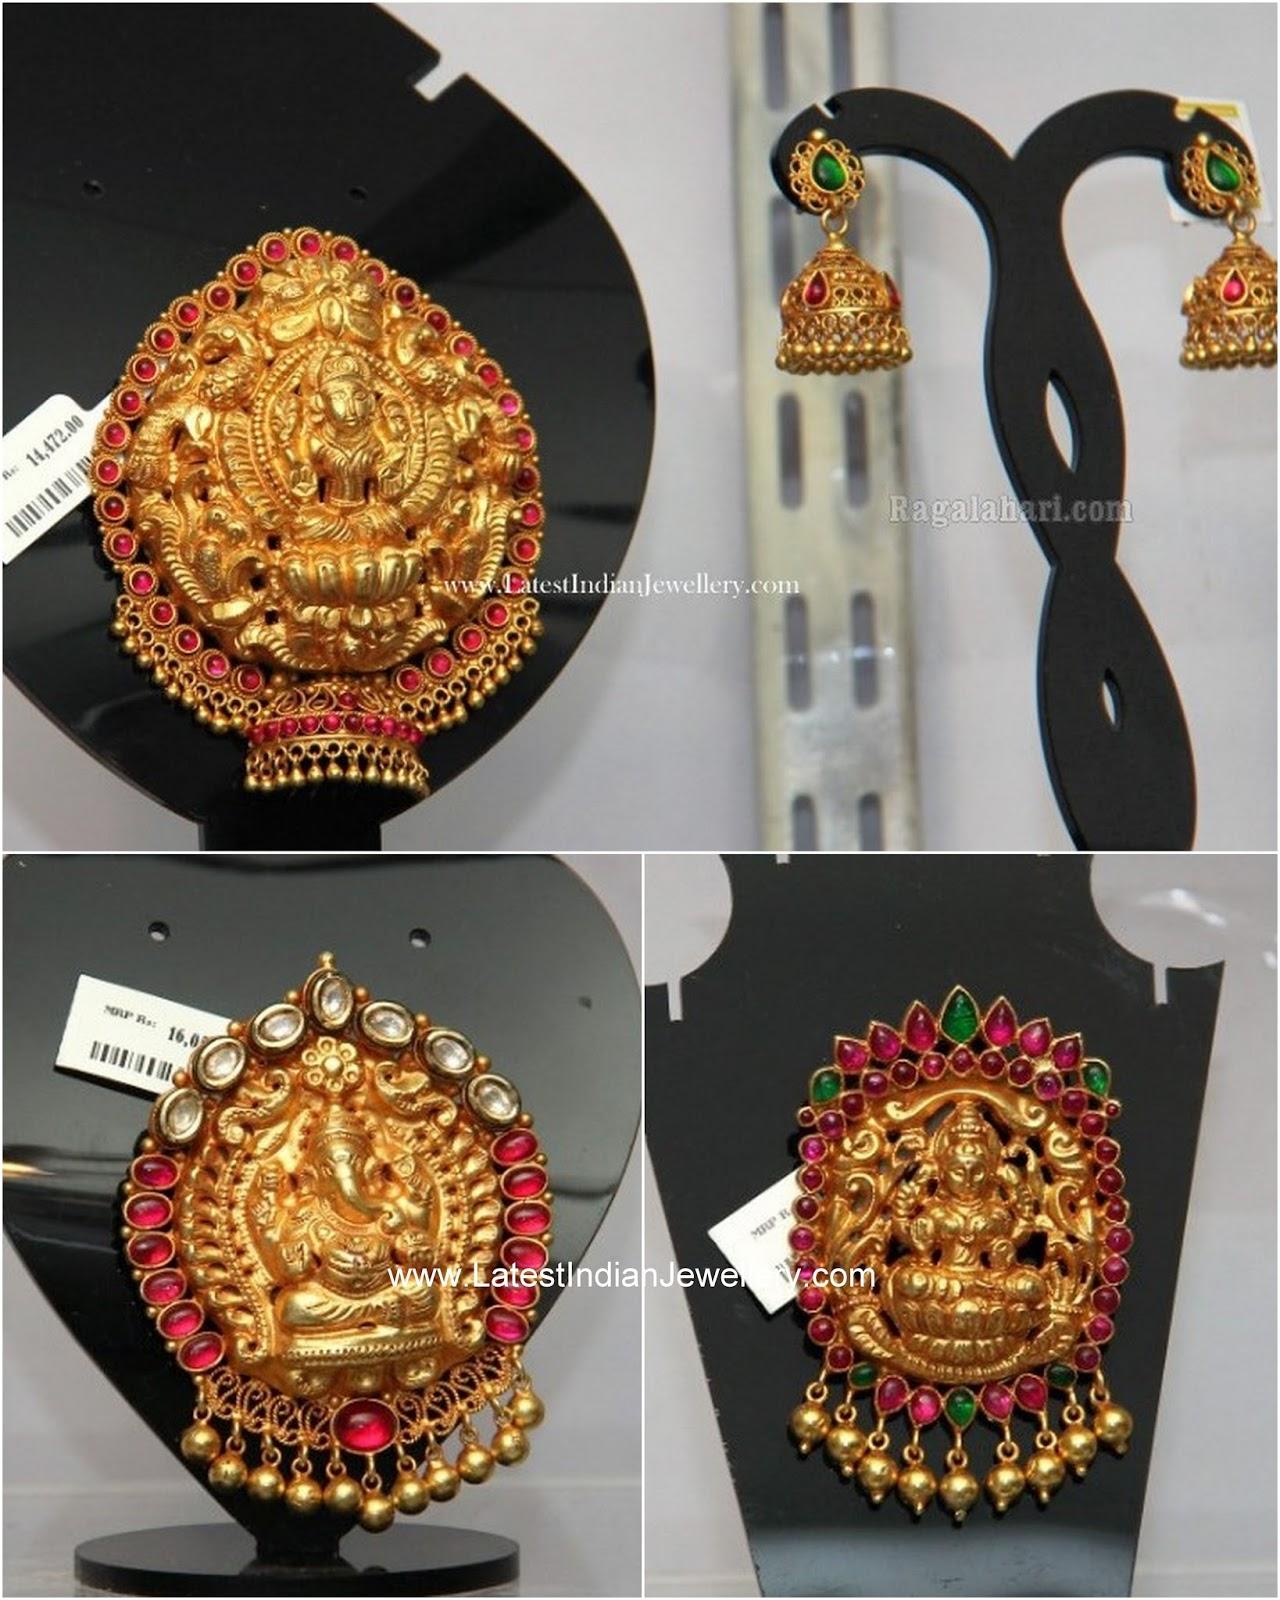 temple jewellery laxmi ganesh pendants